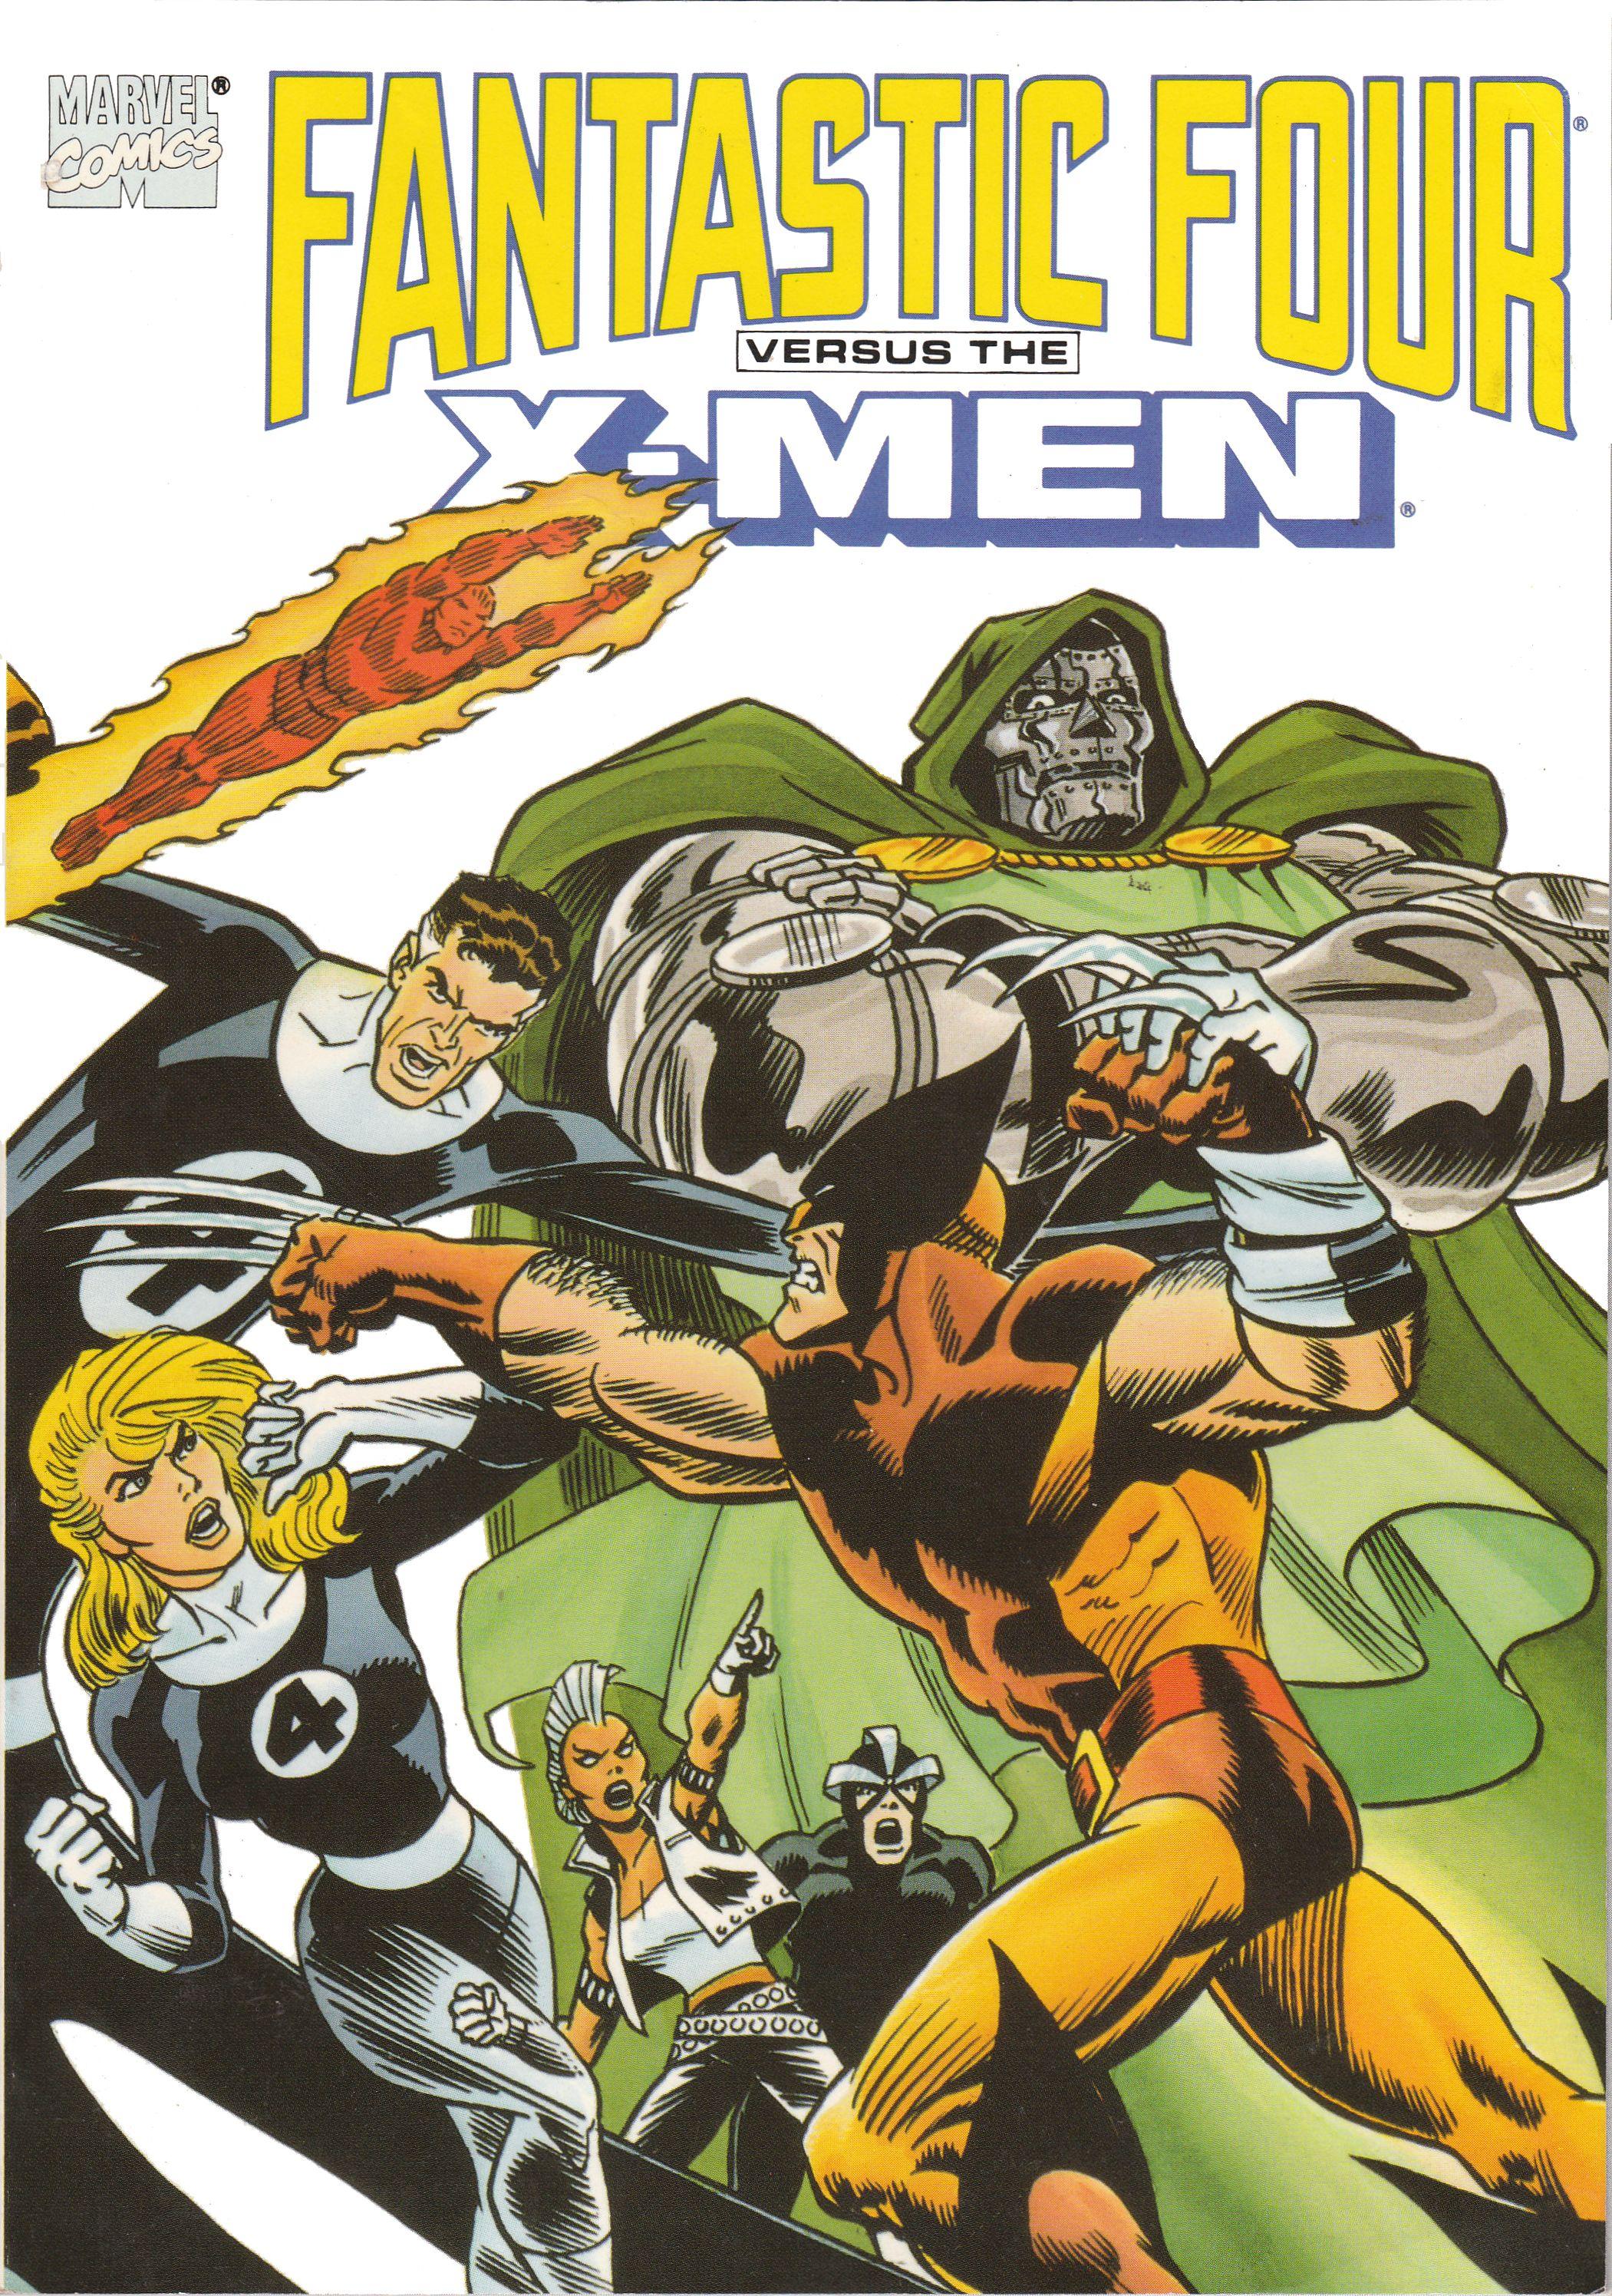 Fantastic Four Vs X Men Trade Cover1 Marvel Comics Covers X Men Marvel Comic Books